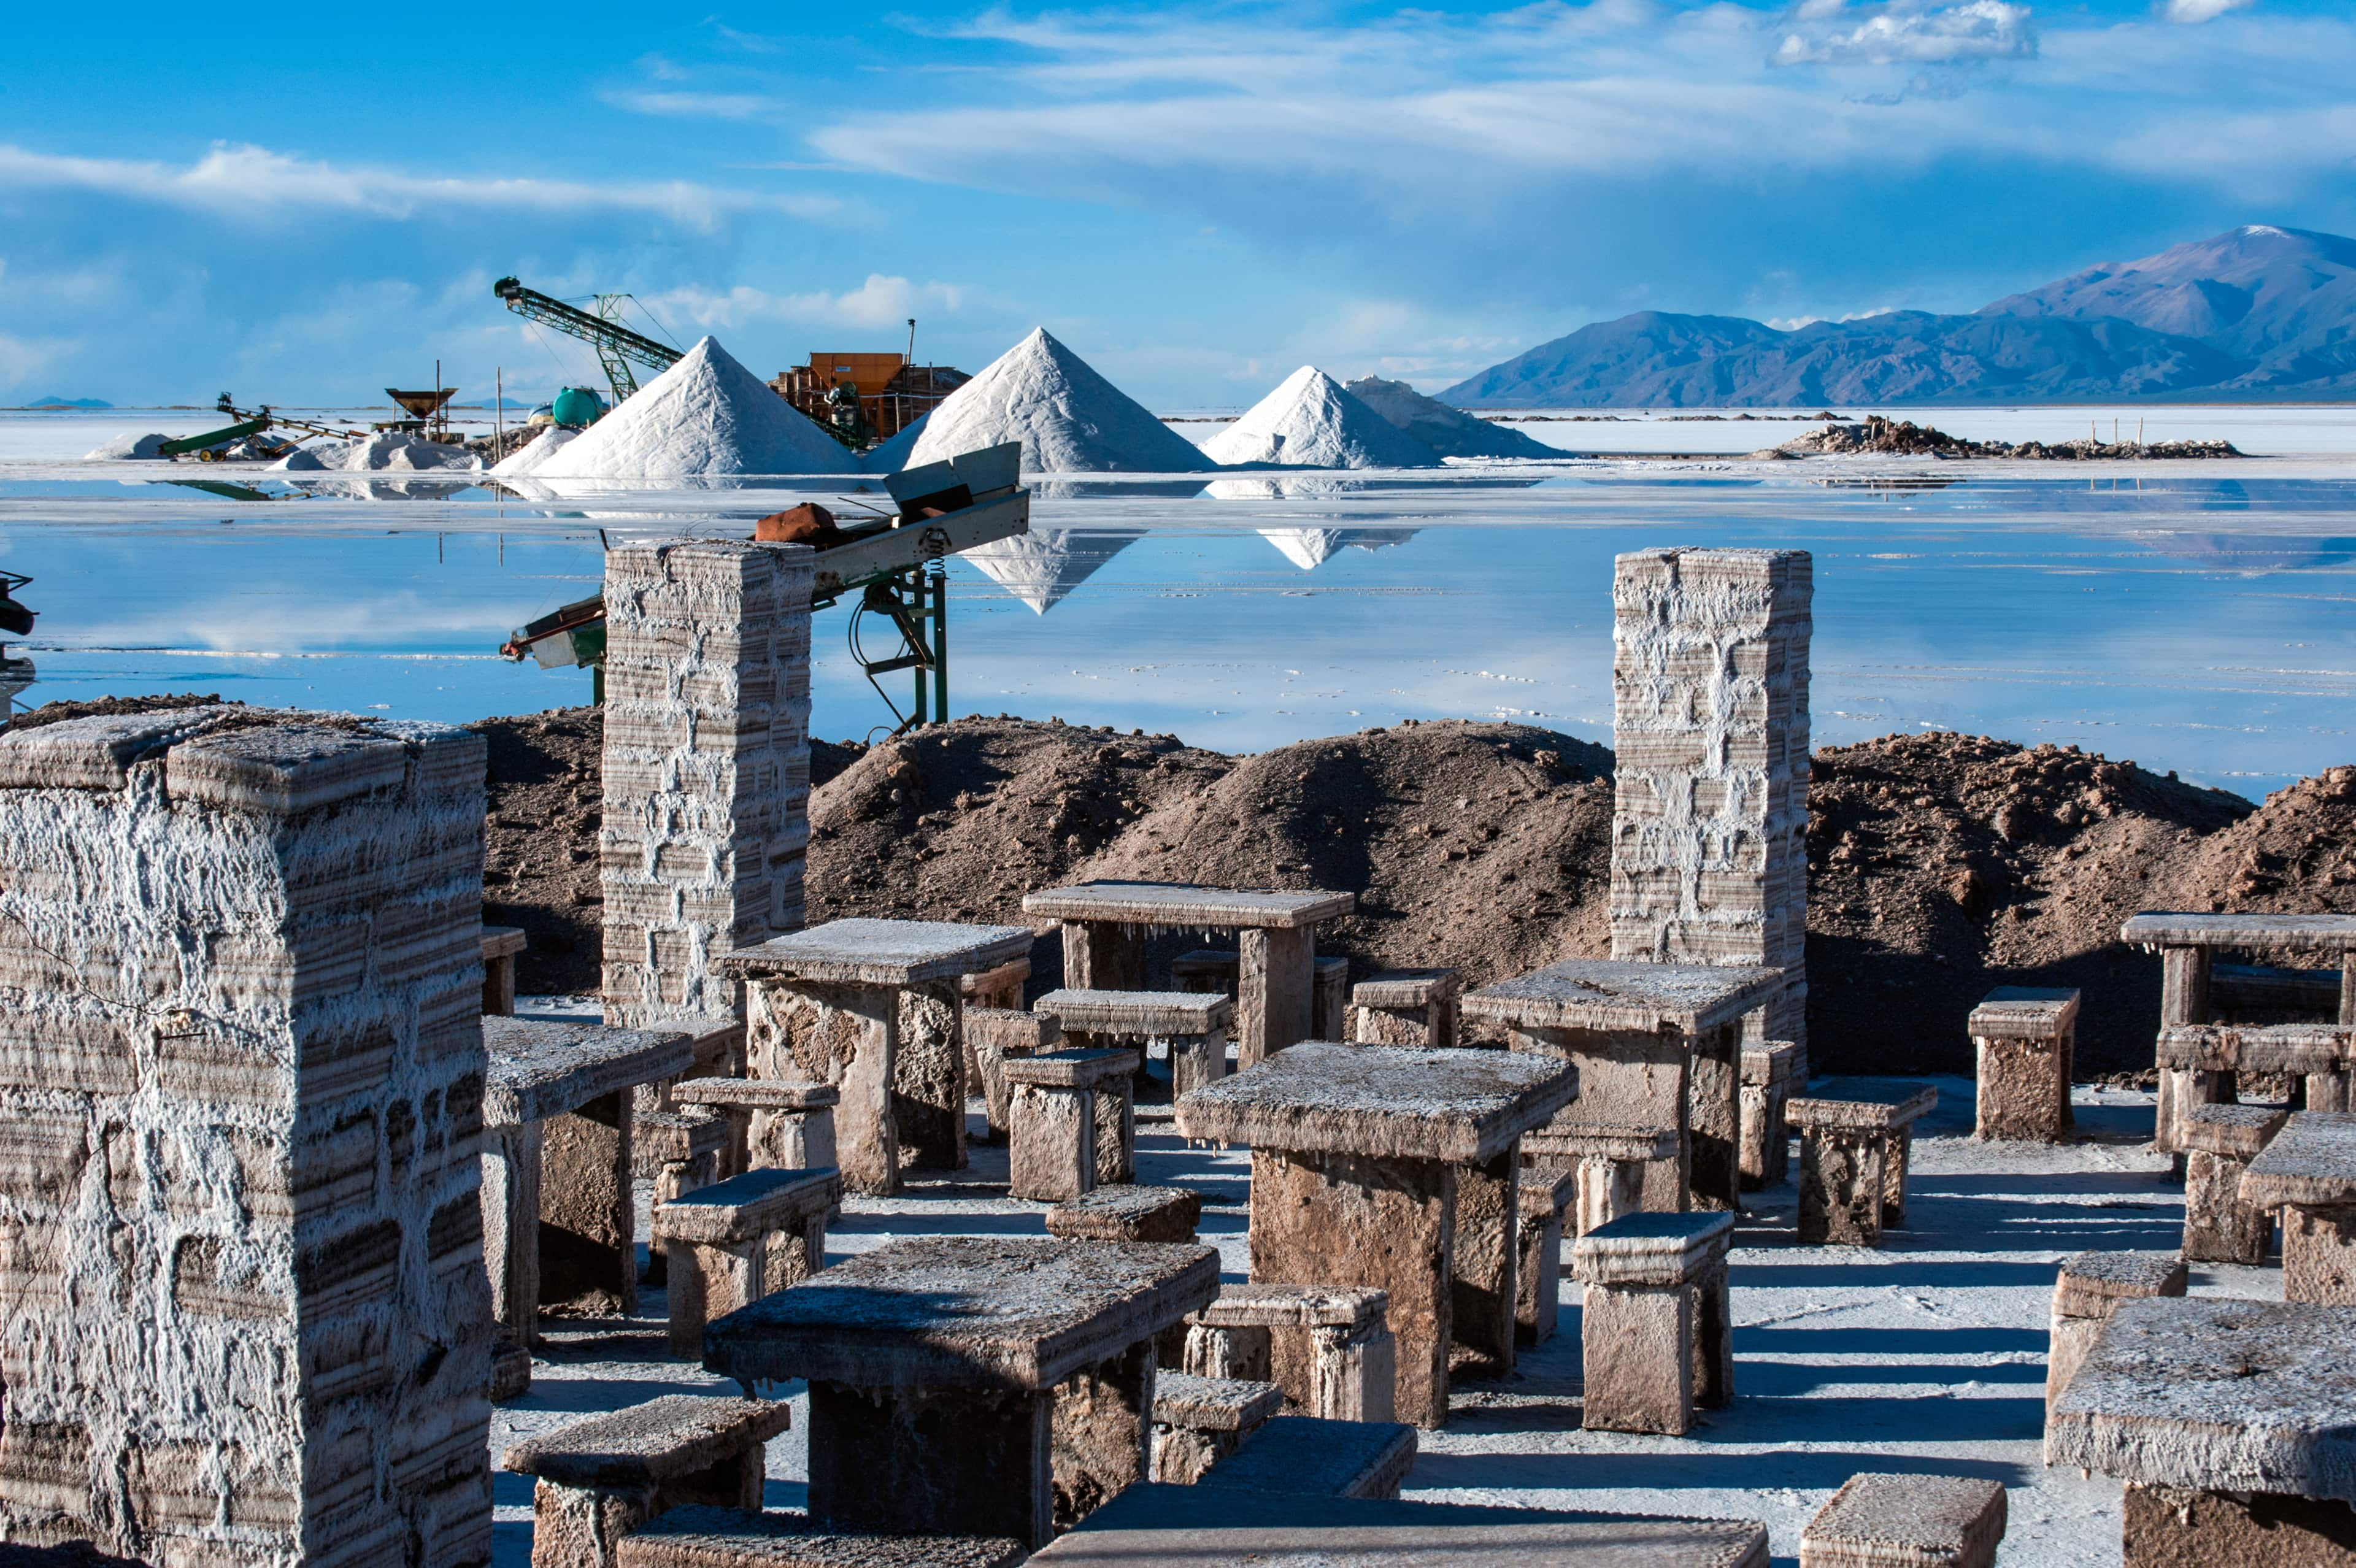 Salinas Grandes, Argentina Andes lithium deposits